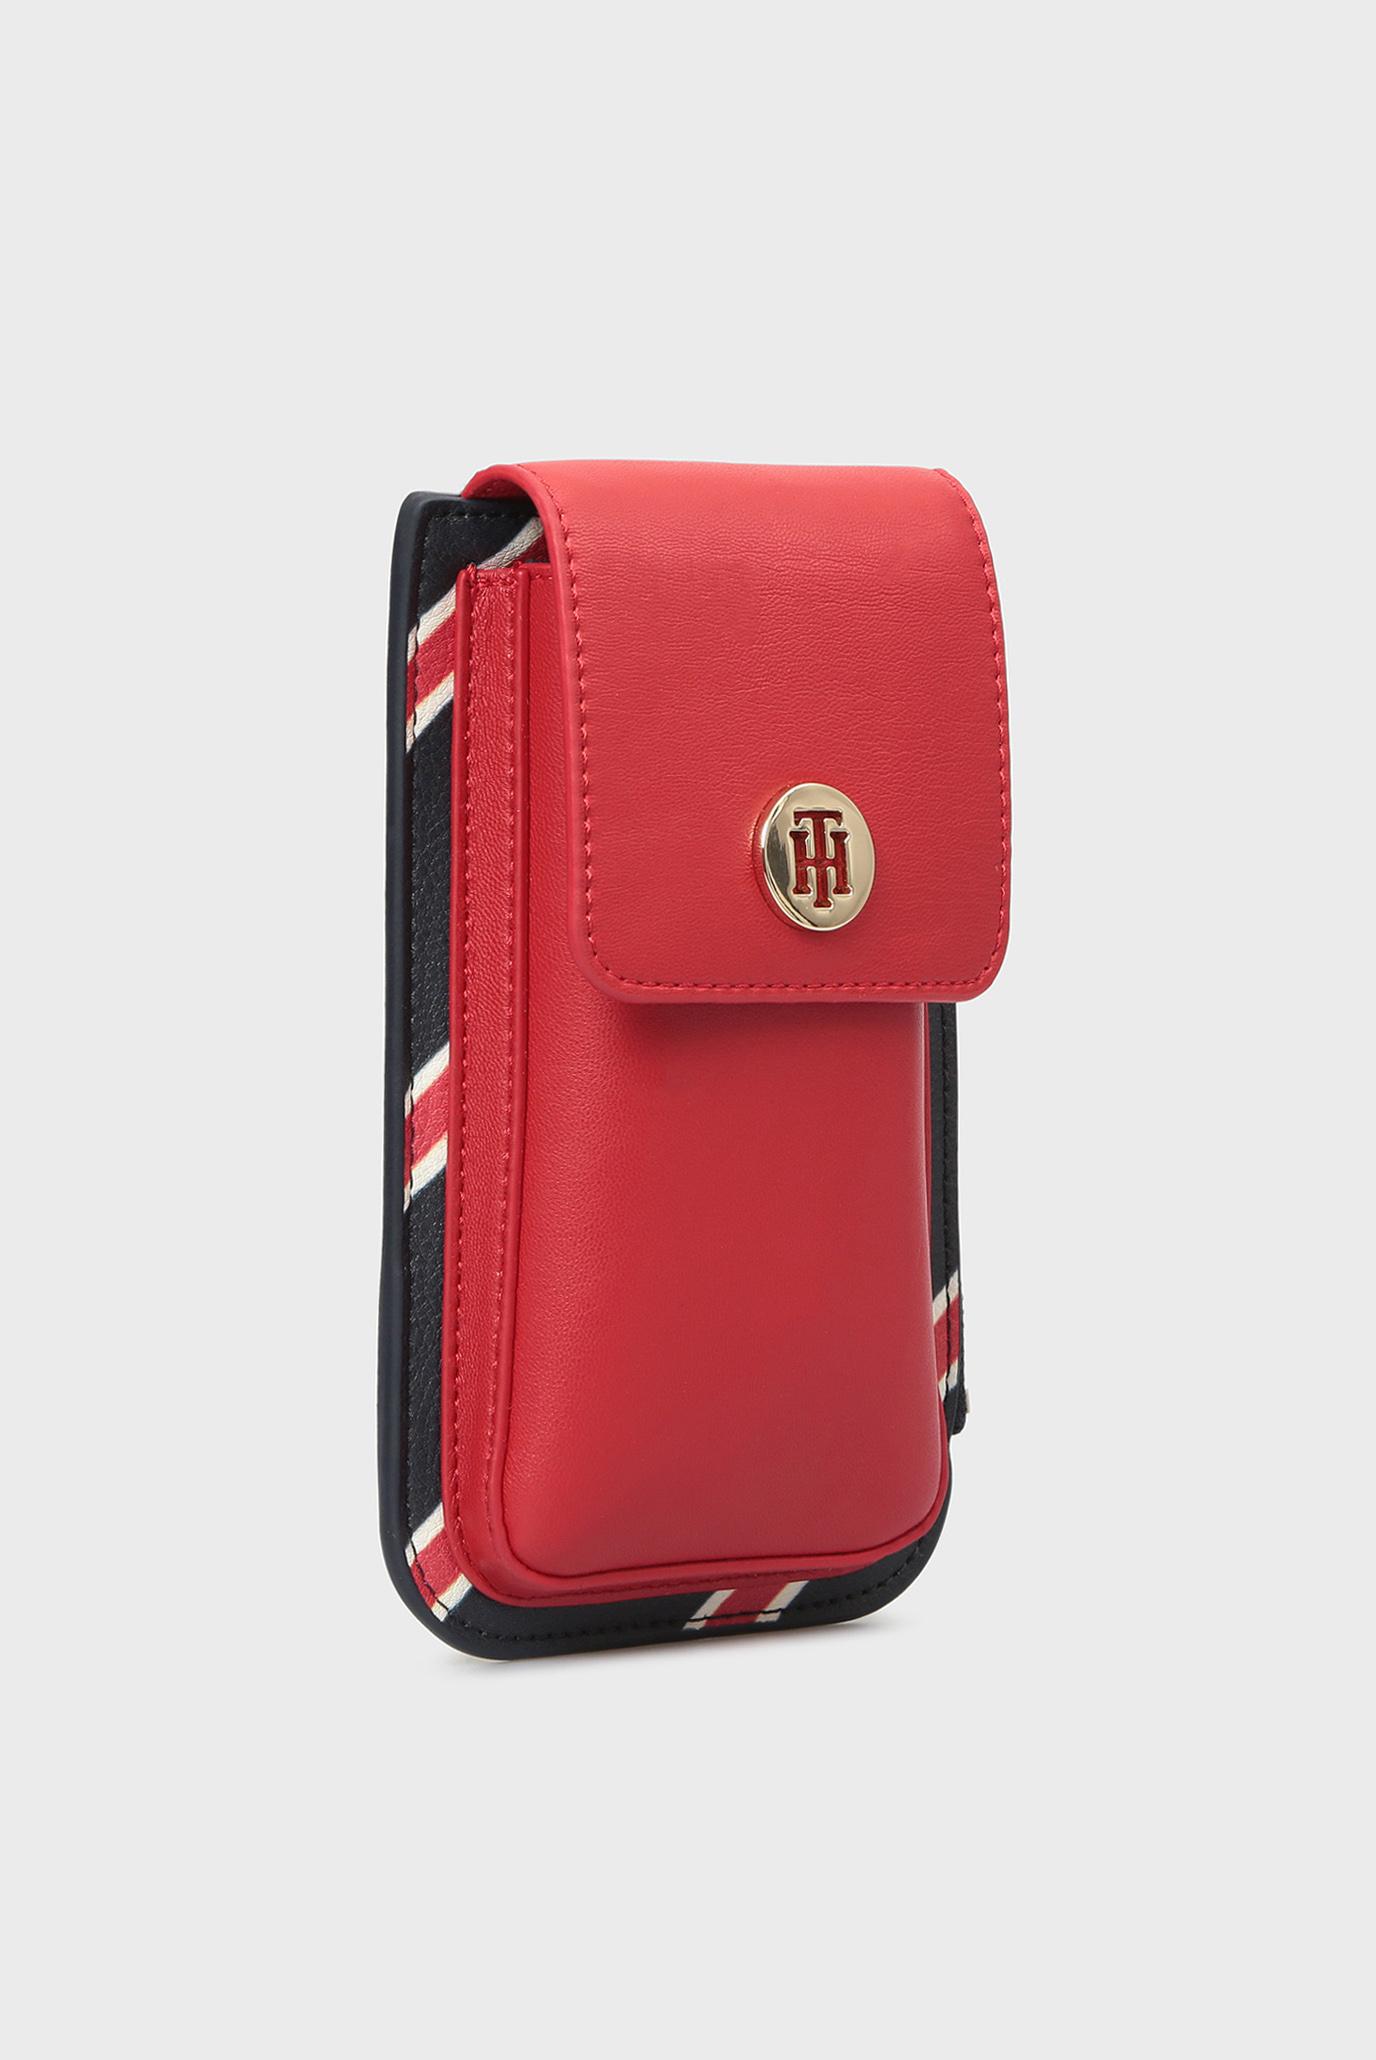 Купить Женская красная сумка-чехол для телефона IDENTITY PHONE POUCH Tommy Hilfiger Tommy Hilfiger AW0AW05808 – Киев, Украина. Цены в интернет магазине MD Fashion